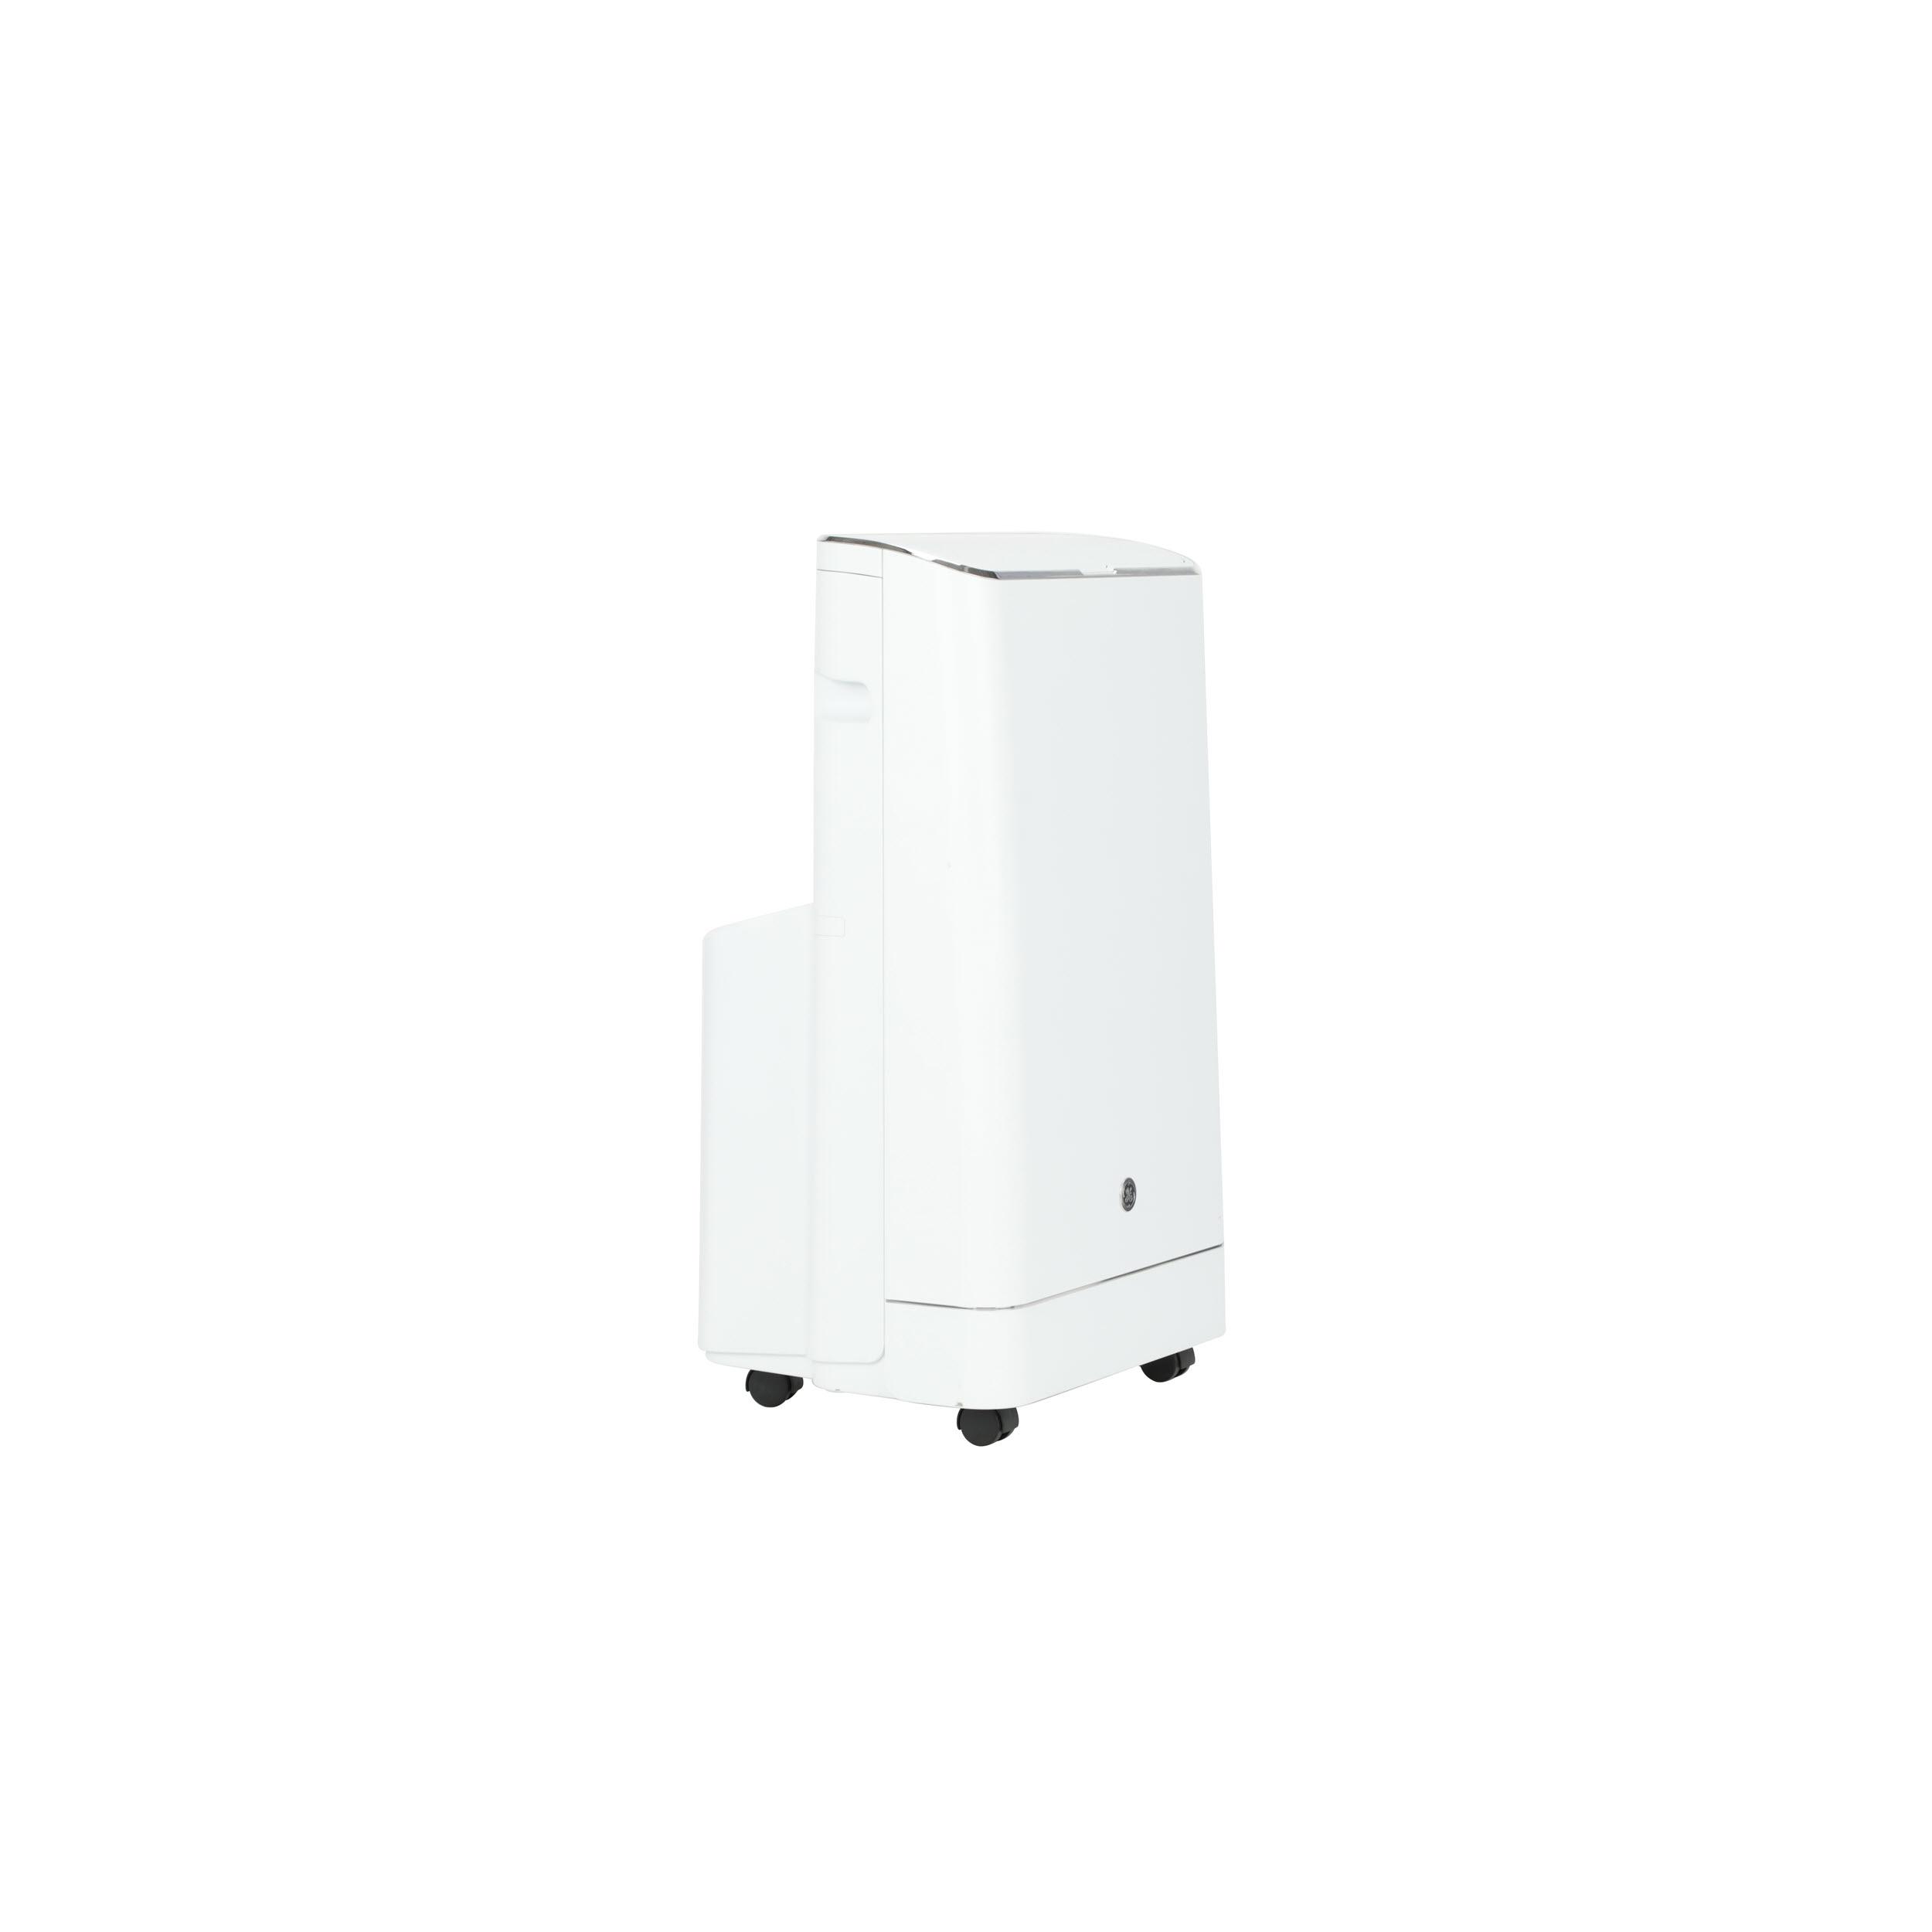 Model: APSA13YZMW | GE GE® Portable Air Conditioner